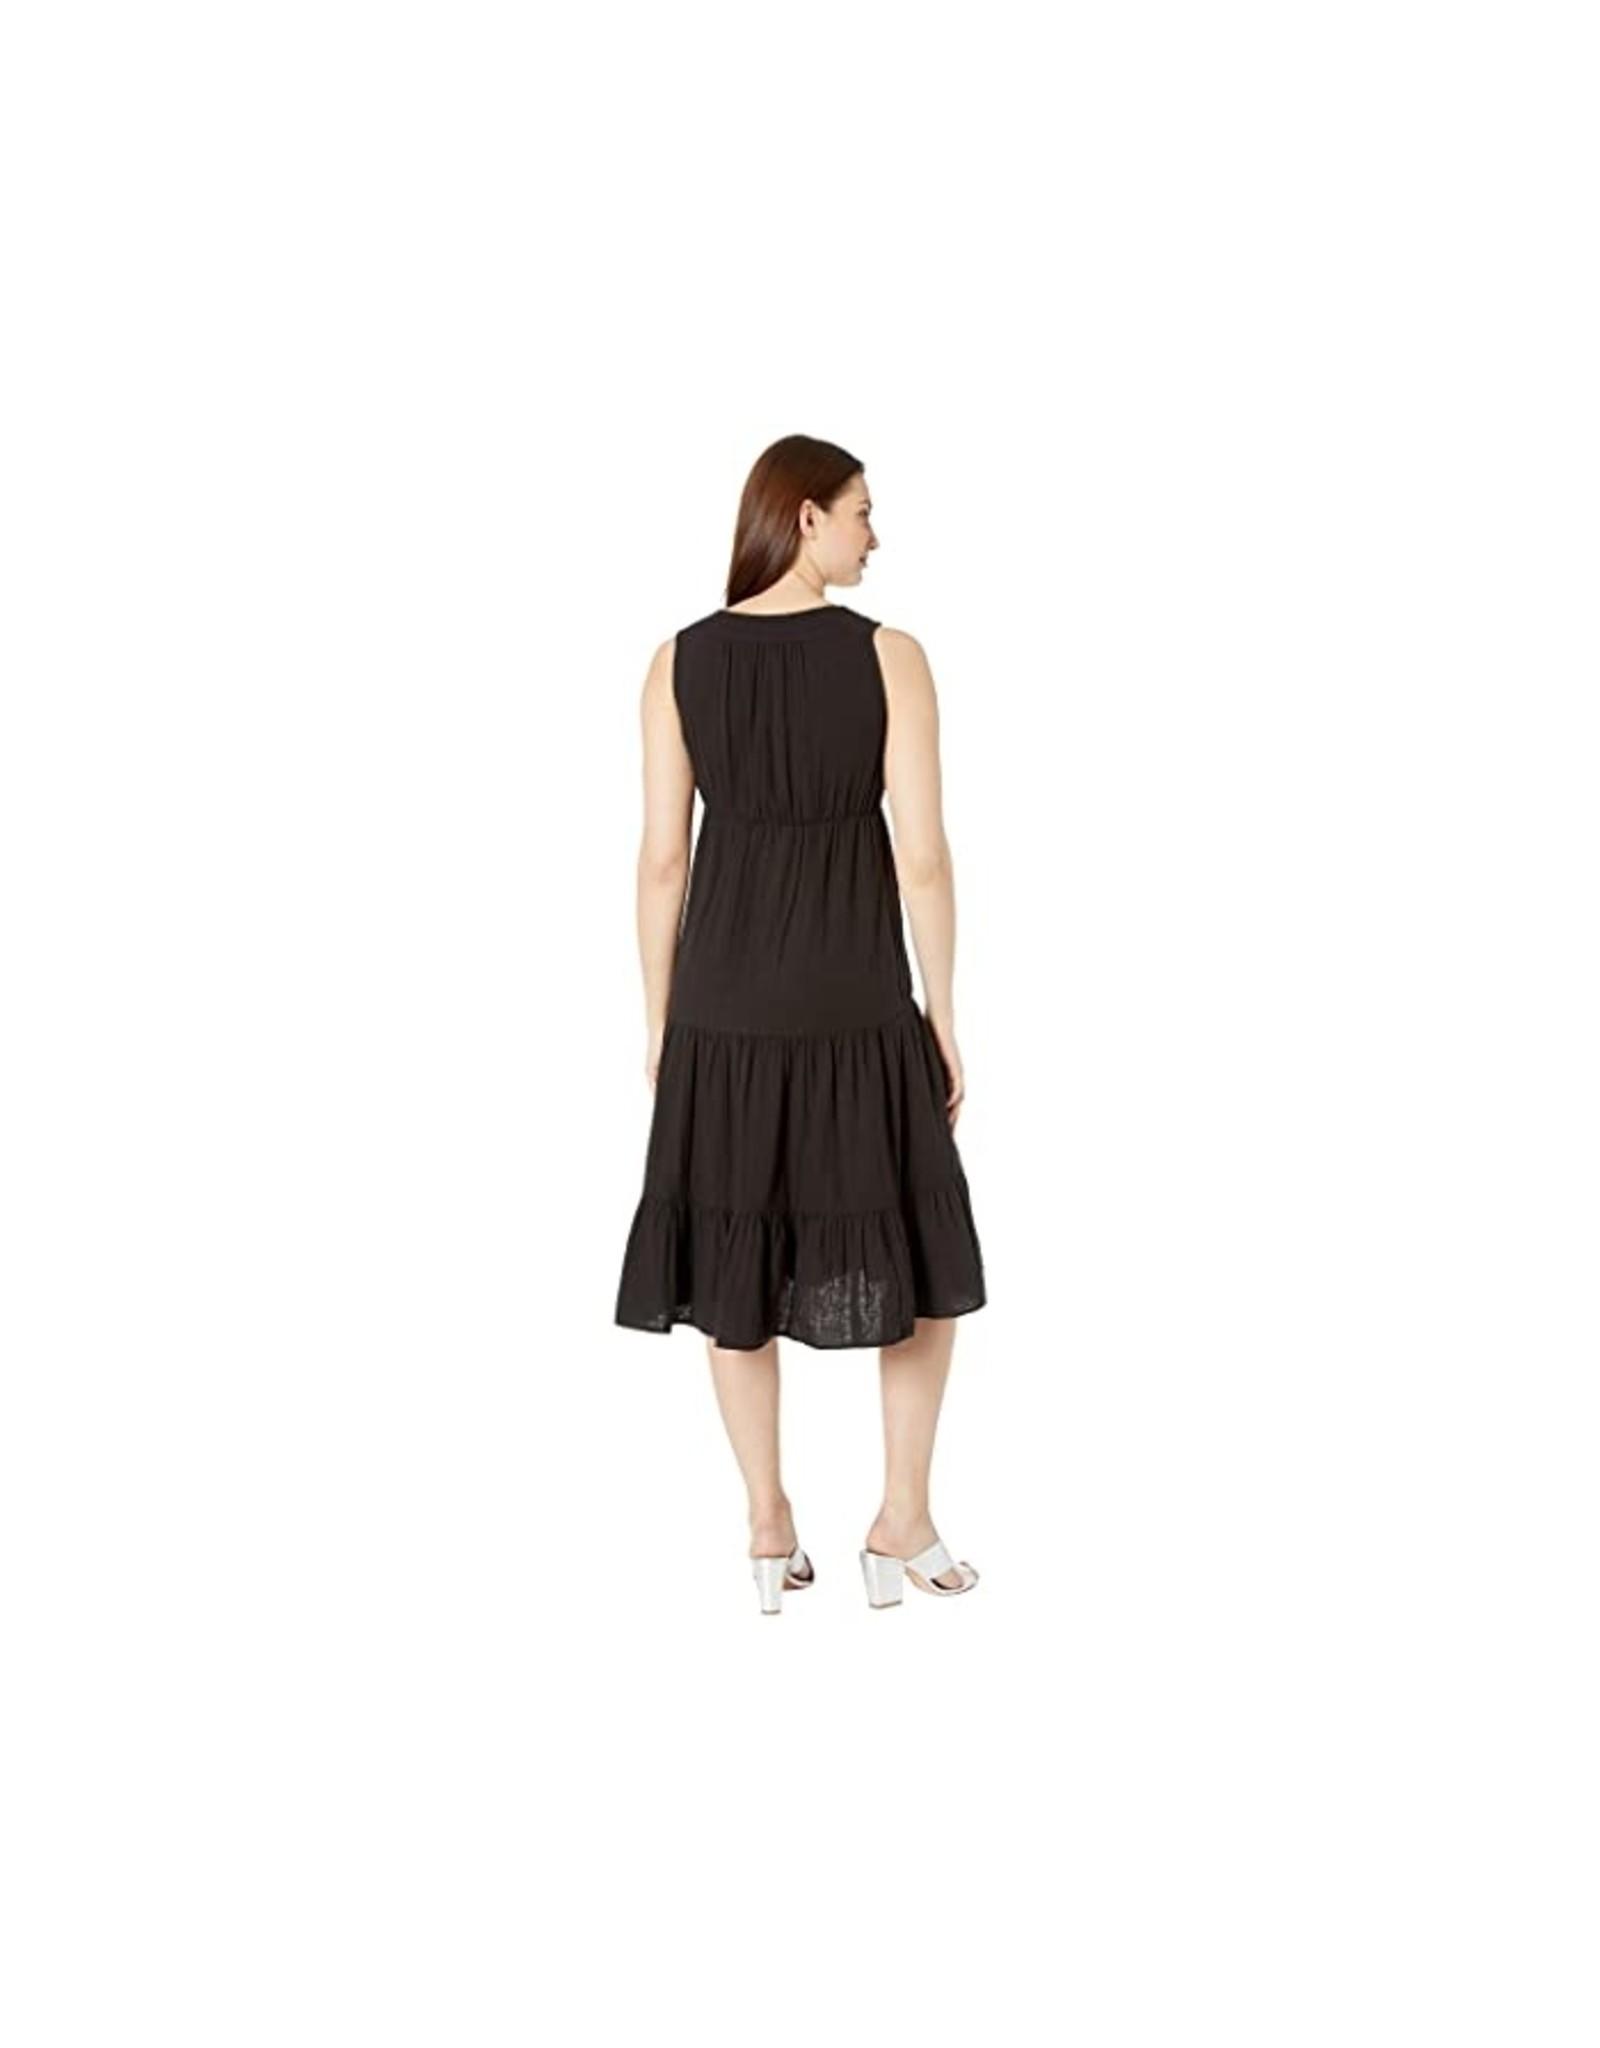 35634 Tiered Dress